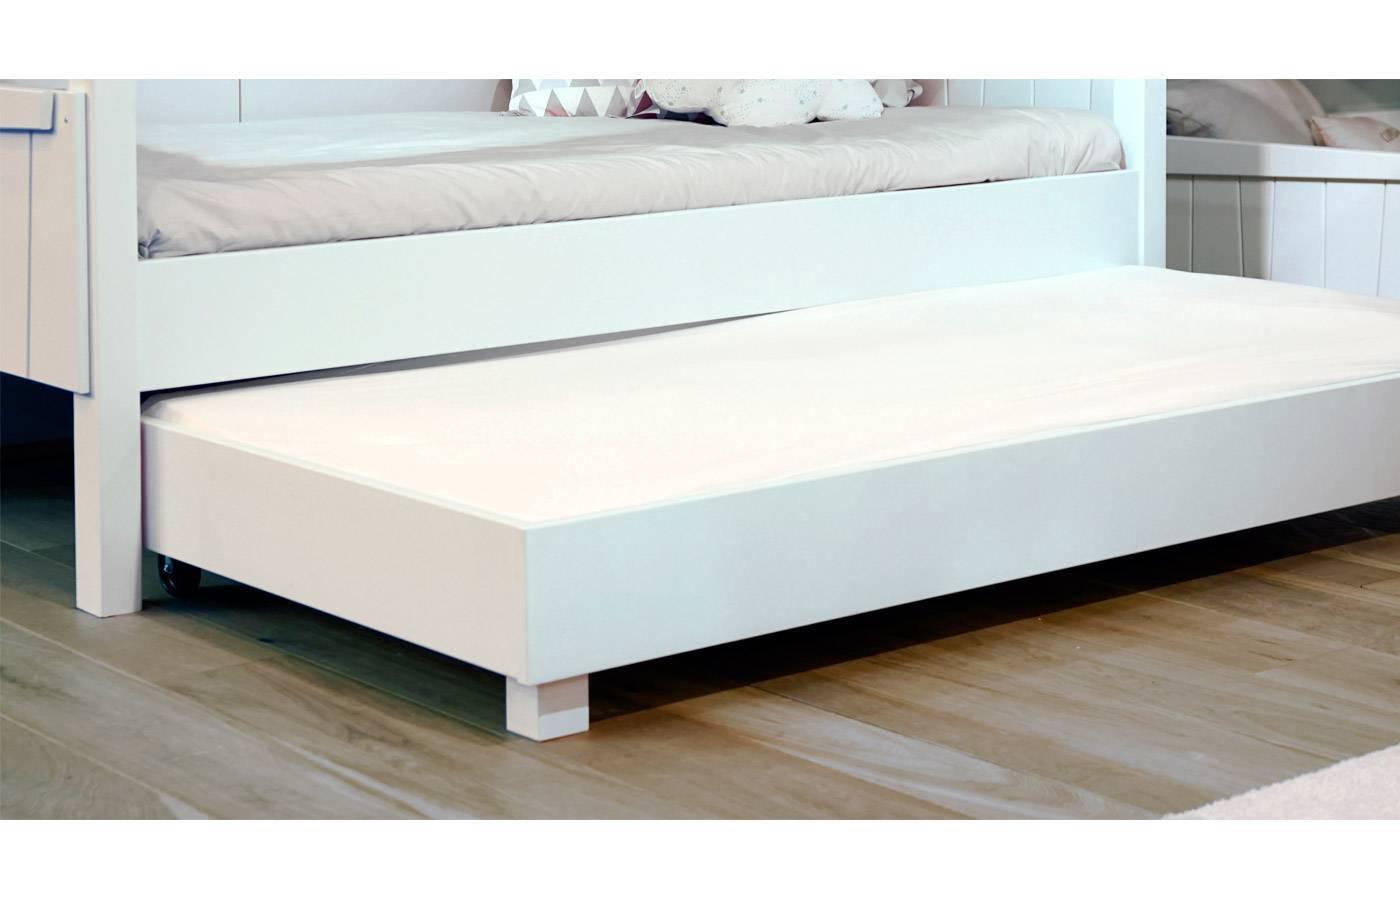 Cama casita con nido blanca de mathy by bols dismobel for Cama nido blanca online